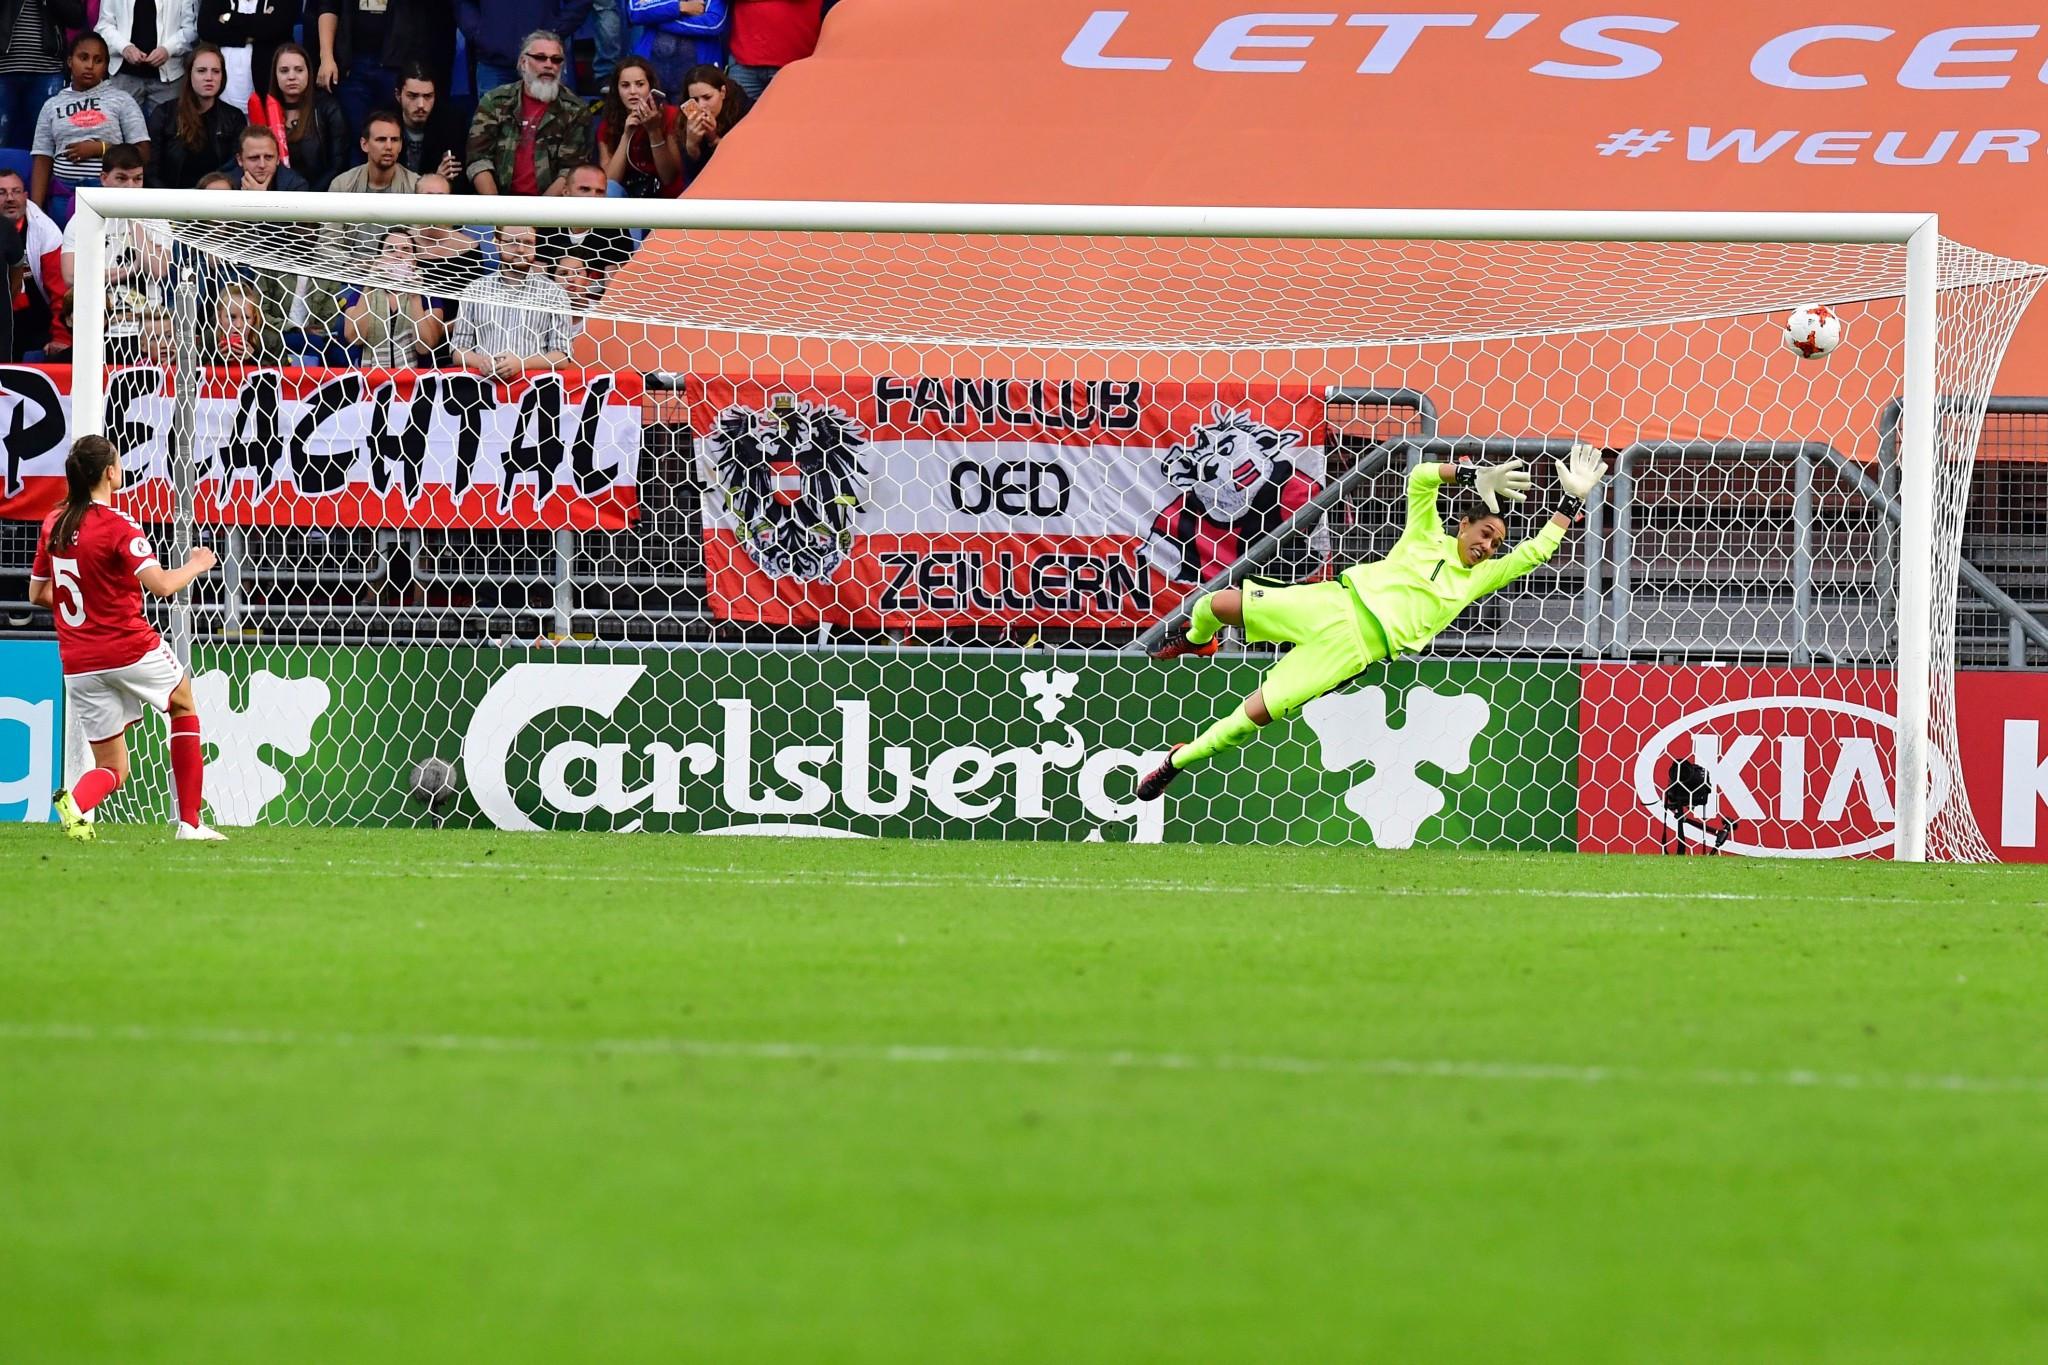 Simone Boye Sørensen scored the winning penalty as Denmark beat Austria in the first semi-final ©Getty Images